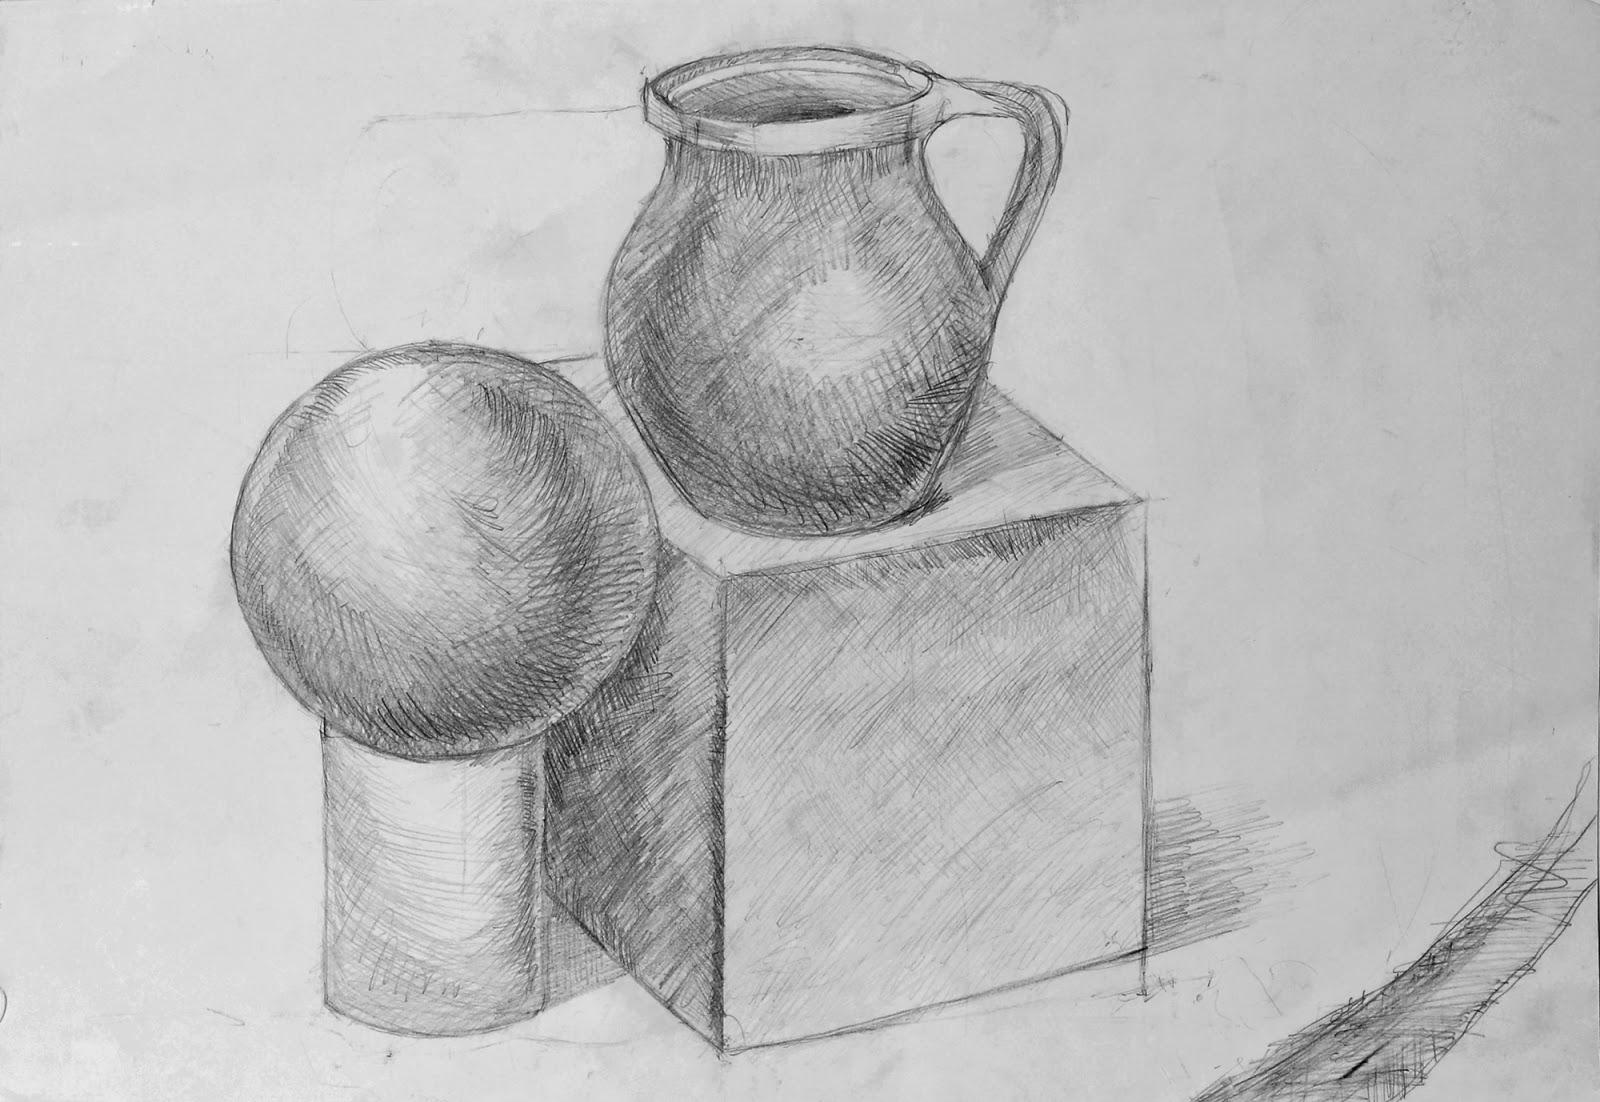 Kiril's Portfolio: Pencil Still Lifes